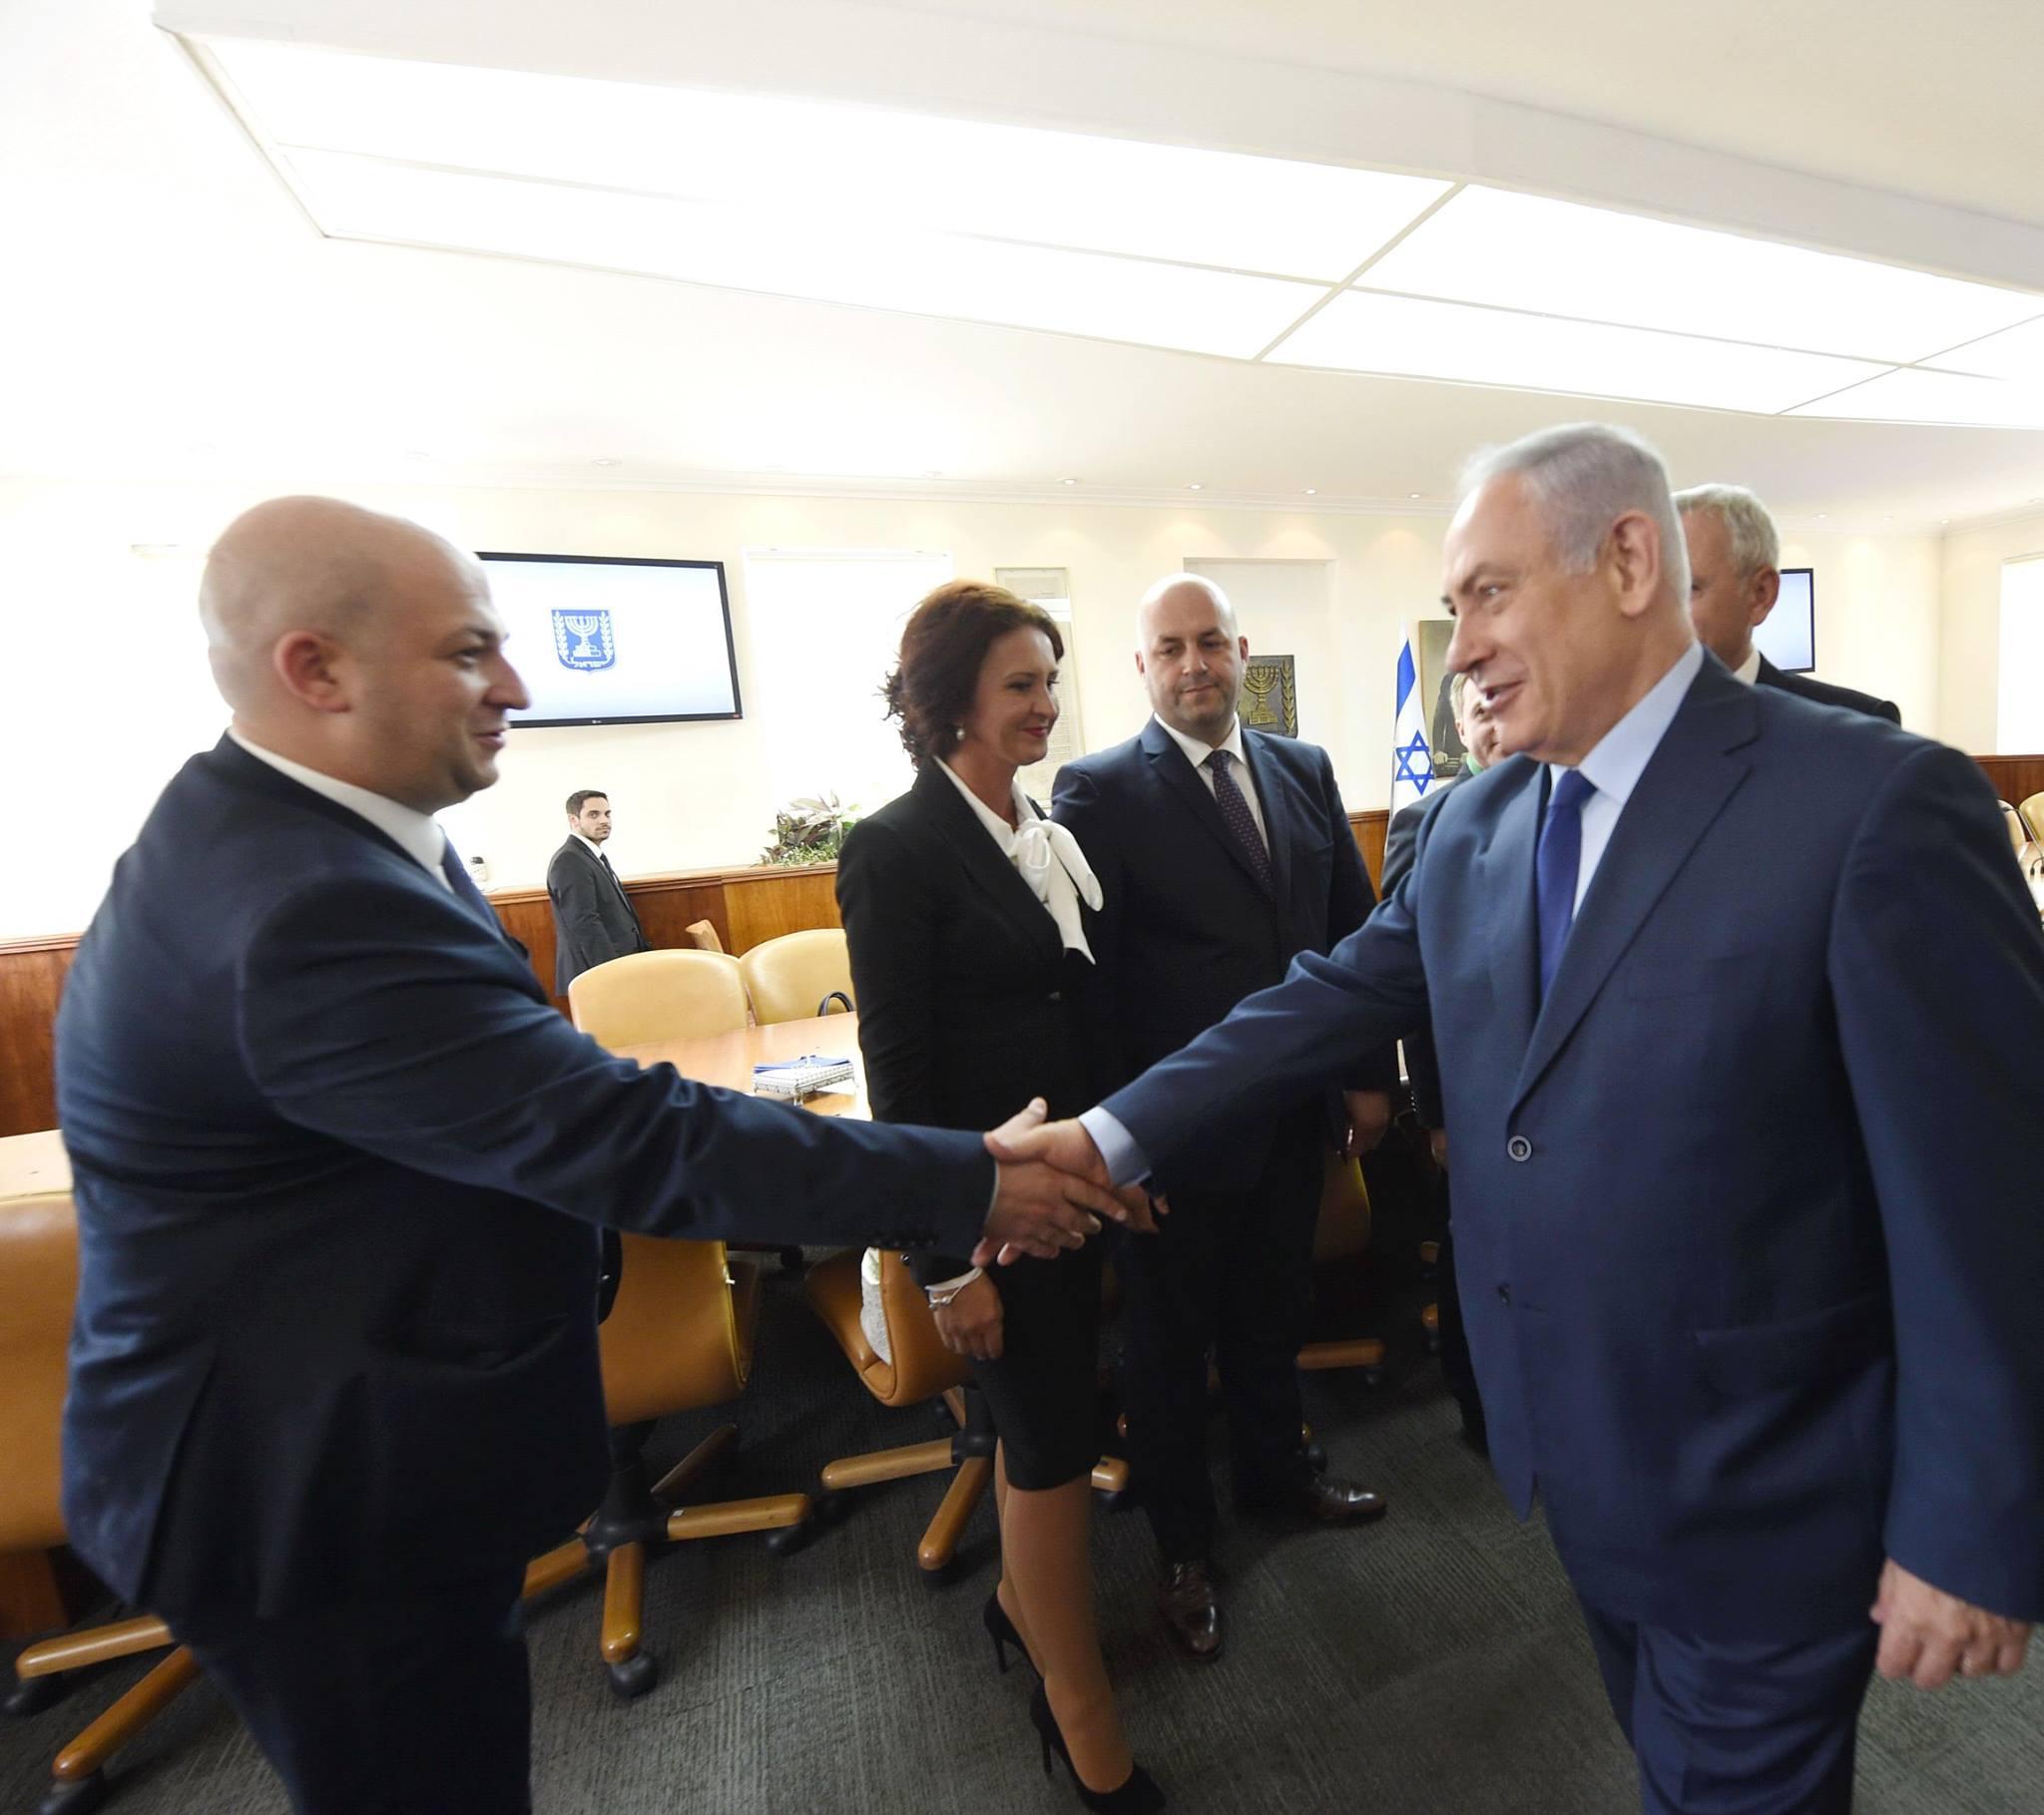 https://i2.wp.com/www.justitiarul.ro/wp-content/uploads/2018/04/S.-Vexler-si-B.-Netanyahu.jpg